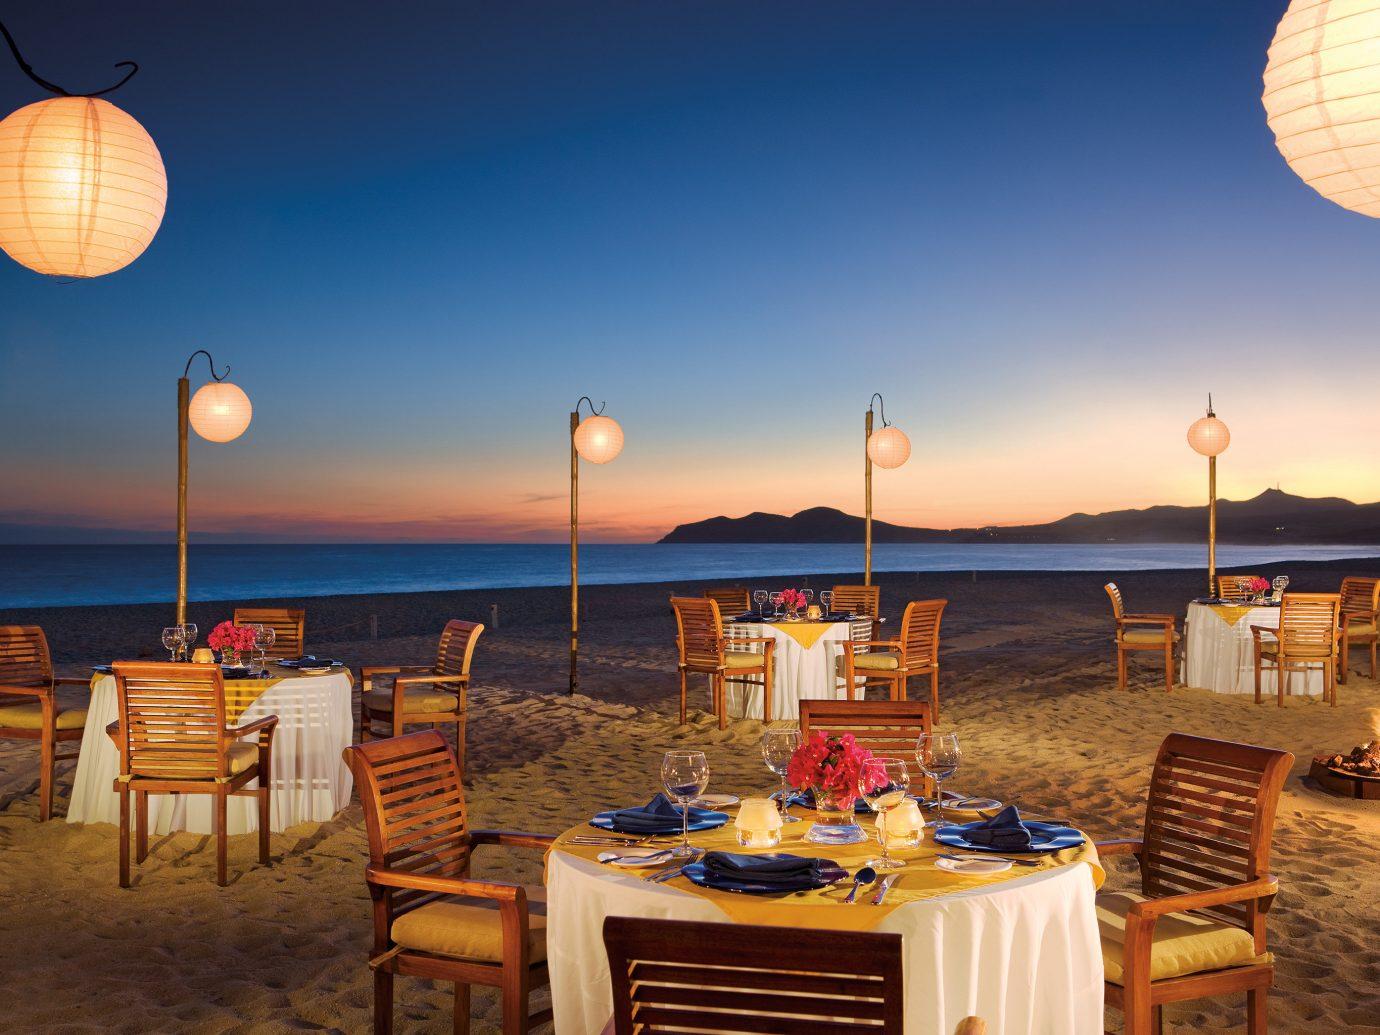 Bar Budget Dining Drink Eat Elegant Hotels Luxury Modern sky outdoor chair evening lighting restaurant Resort set Sunset several day